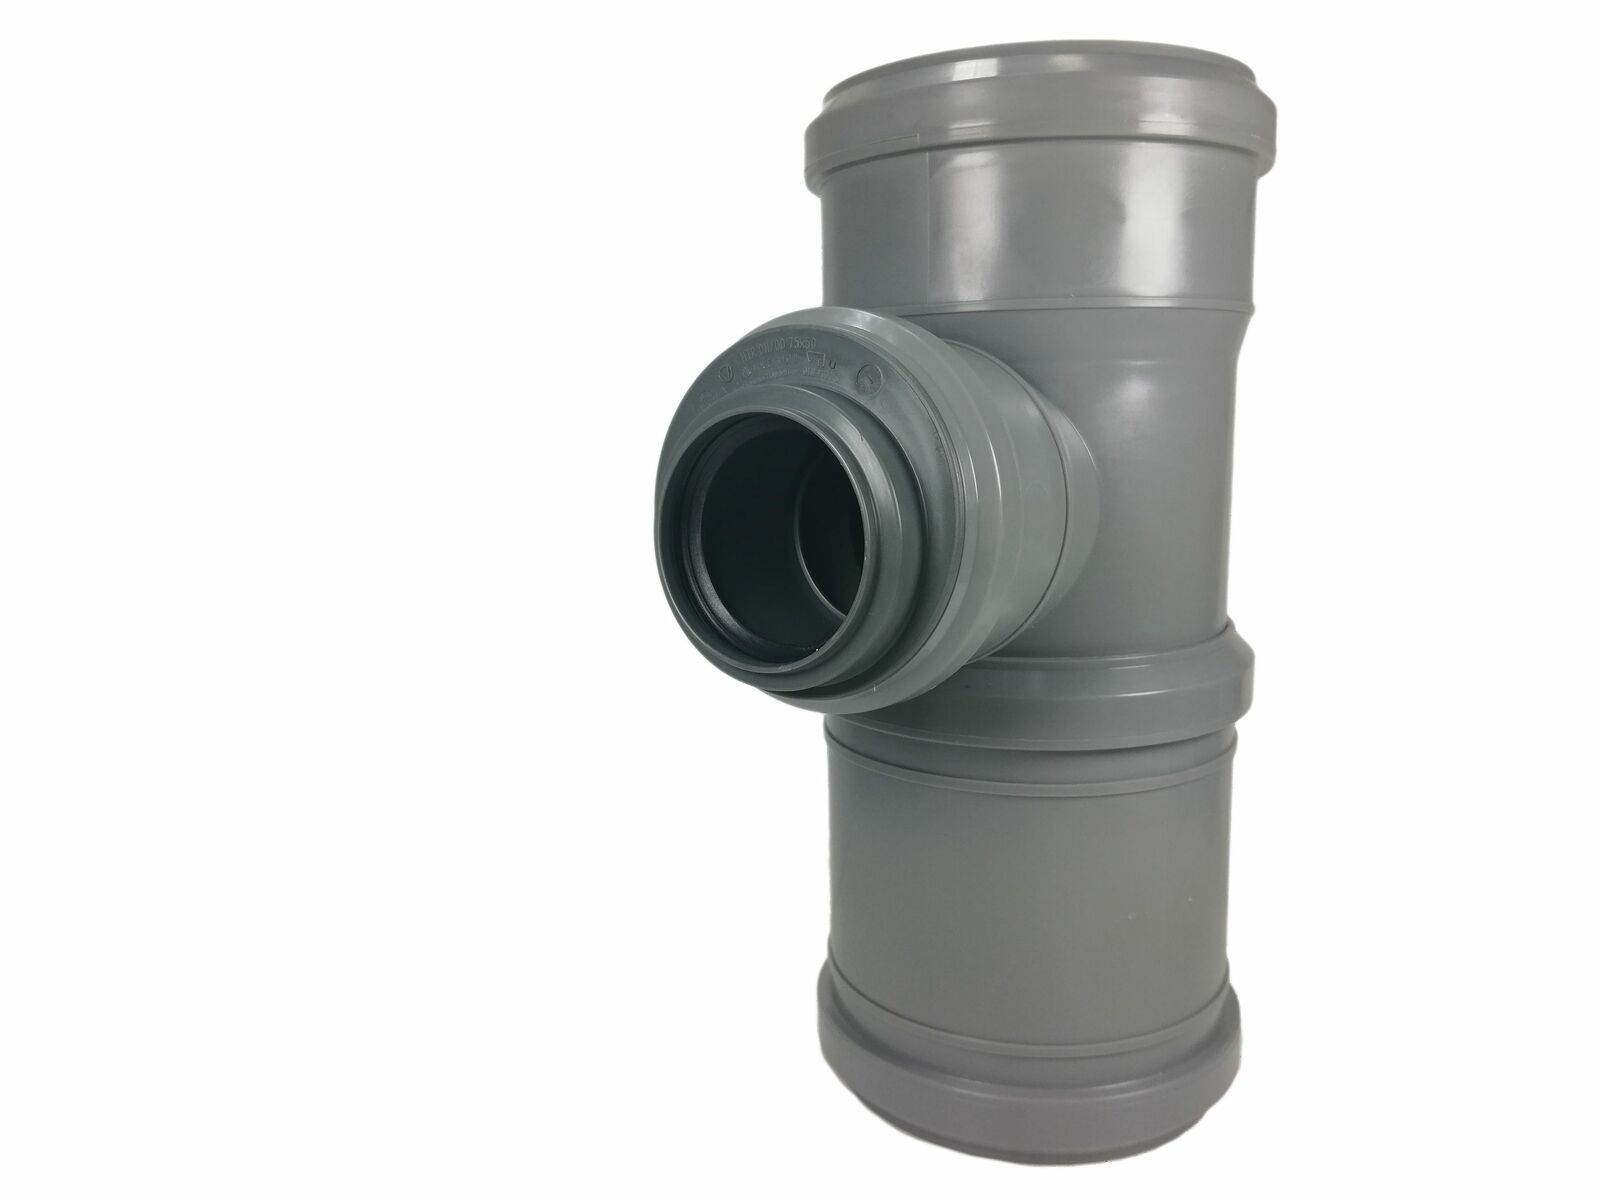 Fallrohr Regensammler Regendieb Regenwassersammler Füllautomat DN 110 DN 50